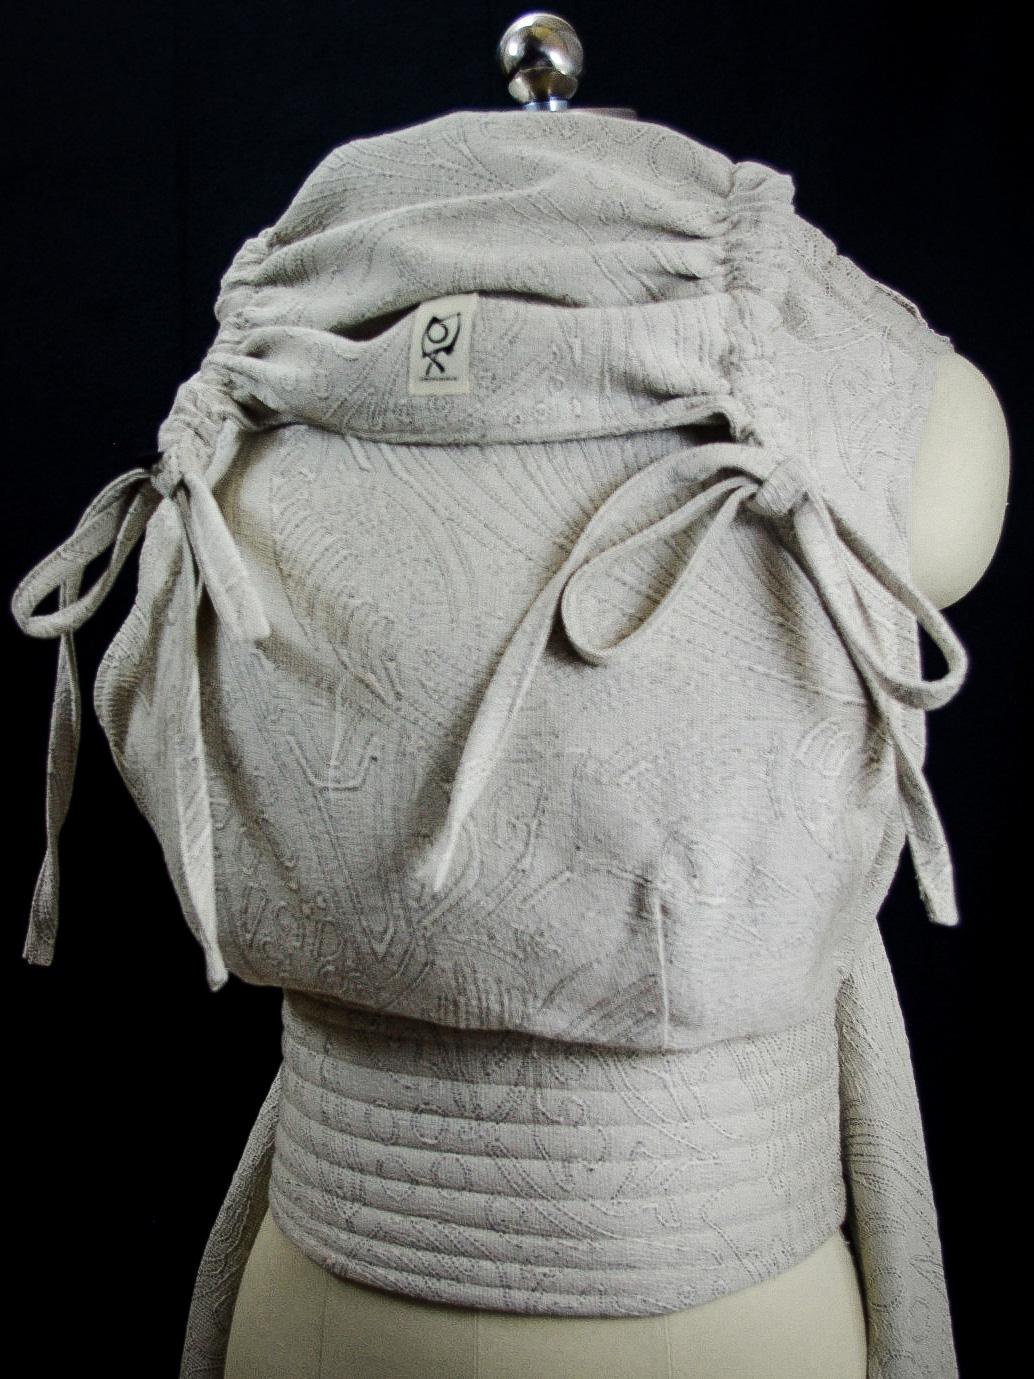 ObiMama Wrap Conversion Mei Tai Pavo Textiles' Charlotte Noir